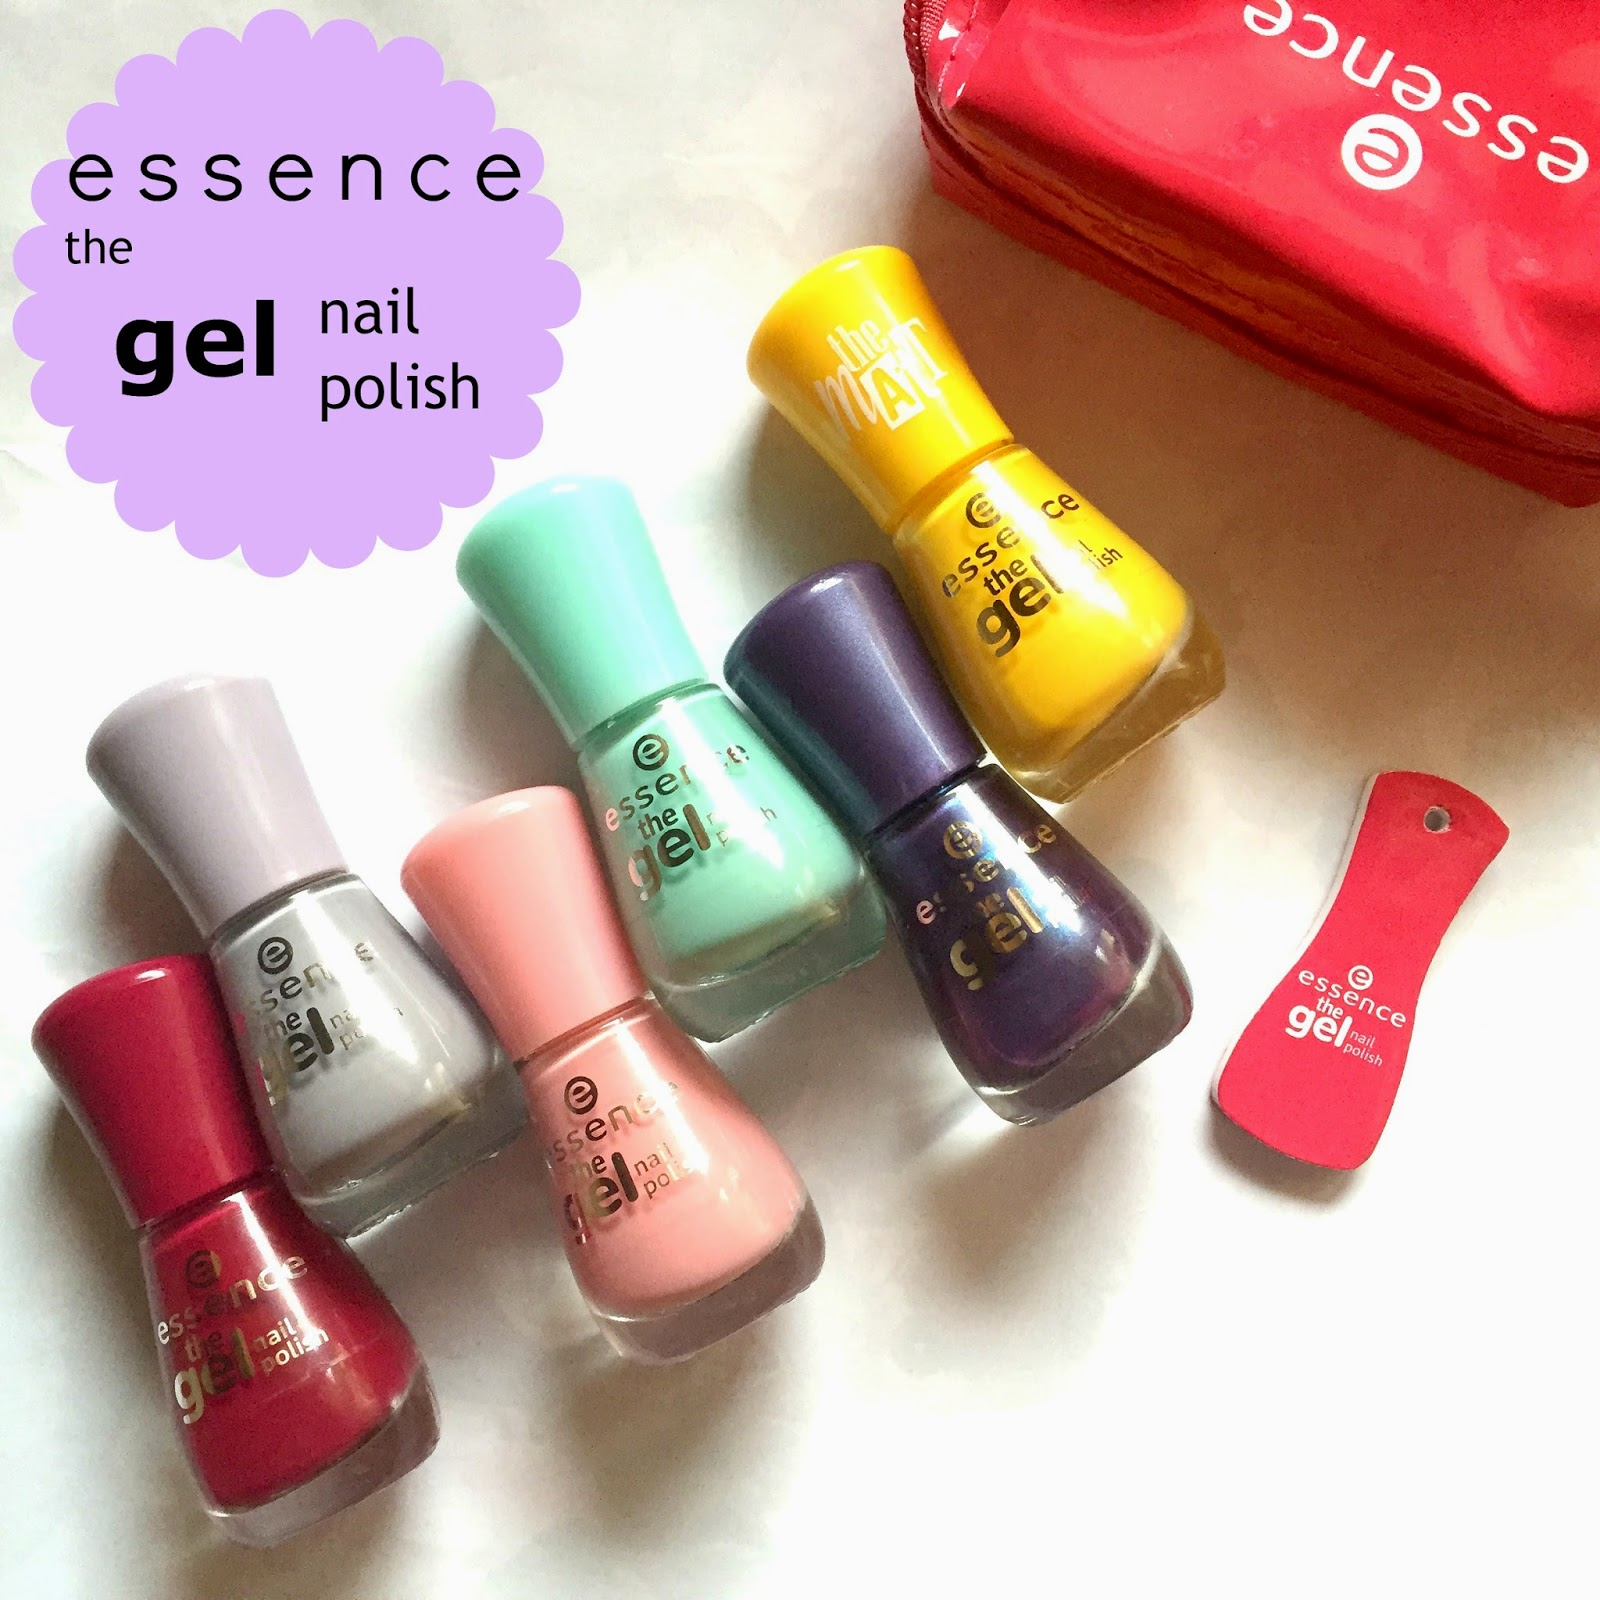 Gel Nail Polishes: Essence 'the Gel Nail Polish'